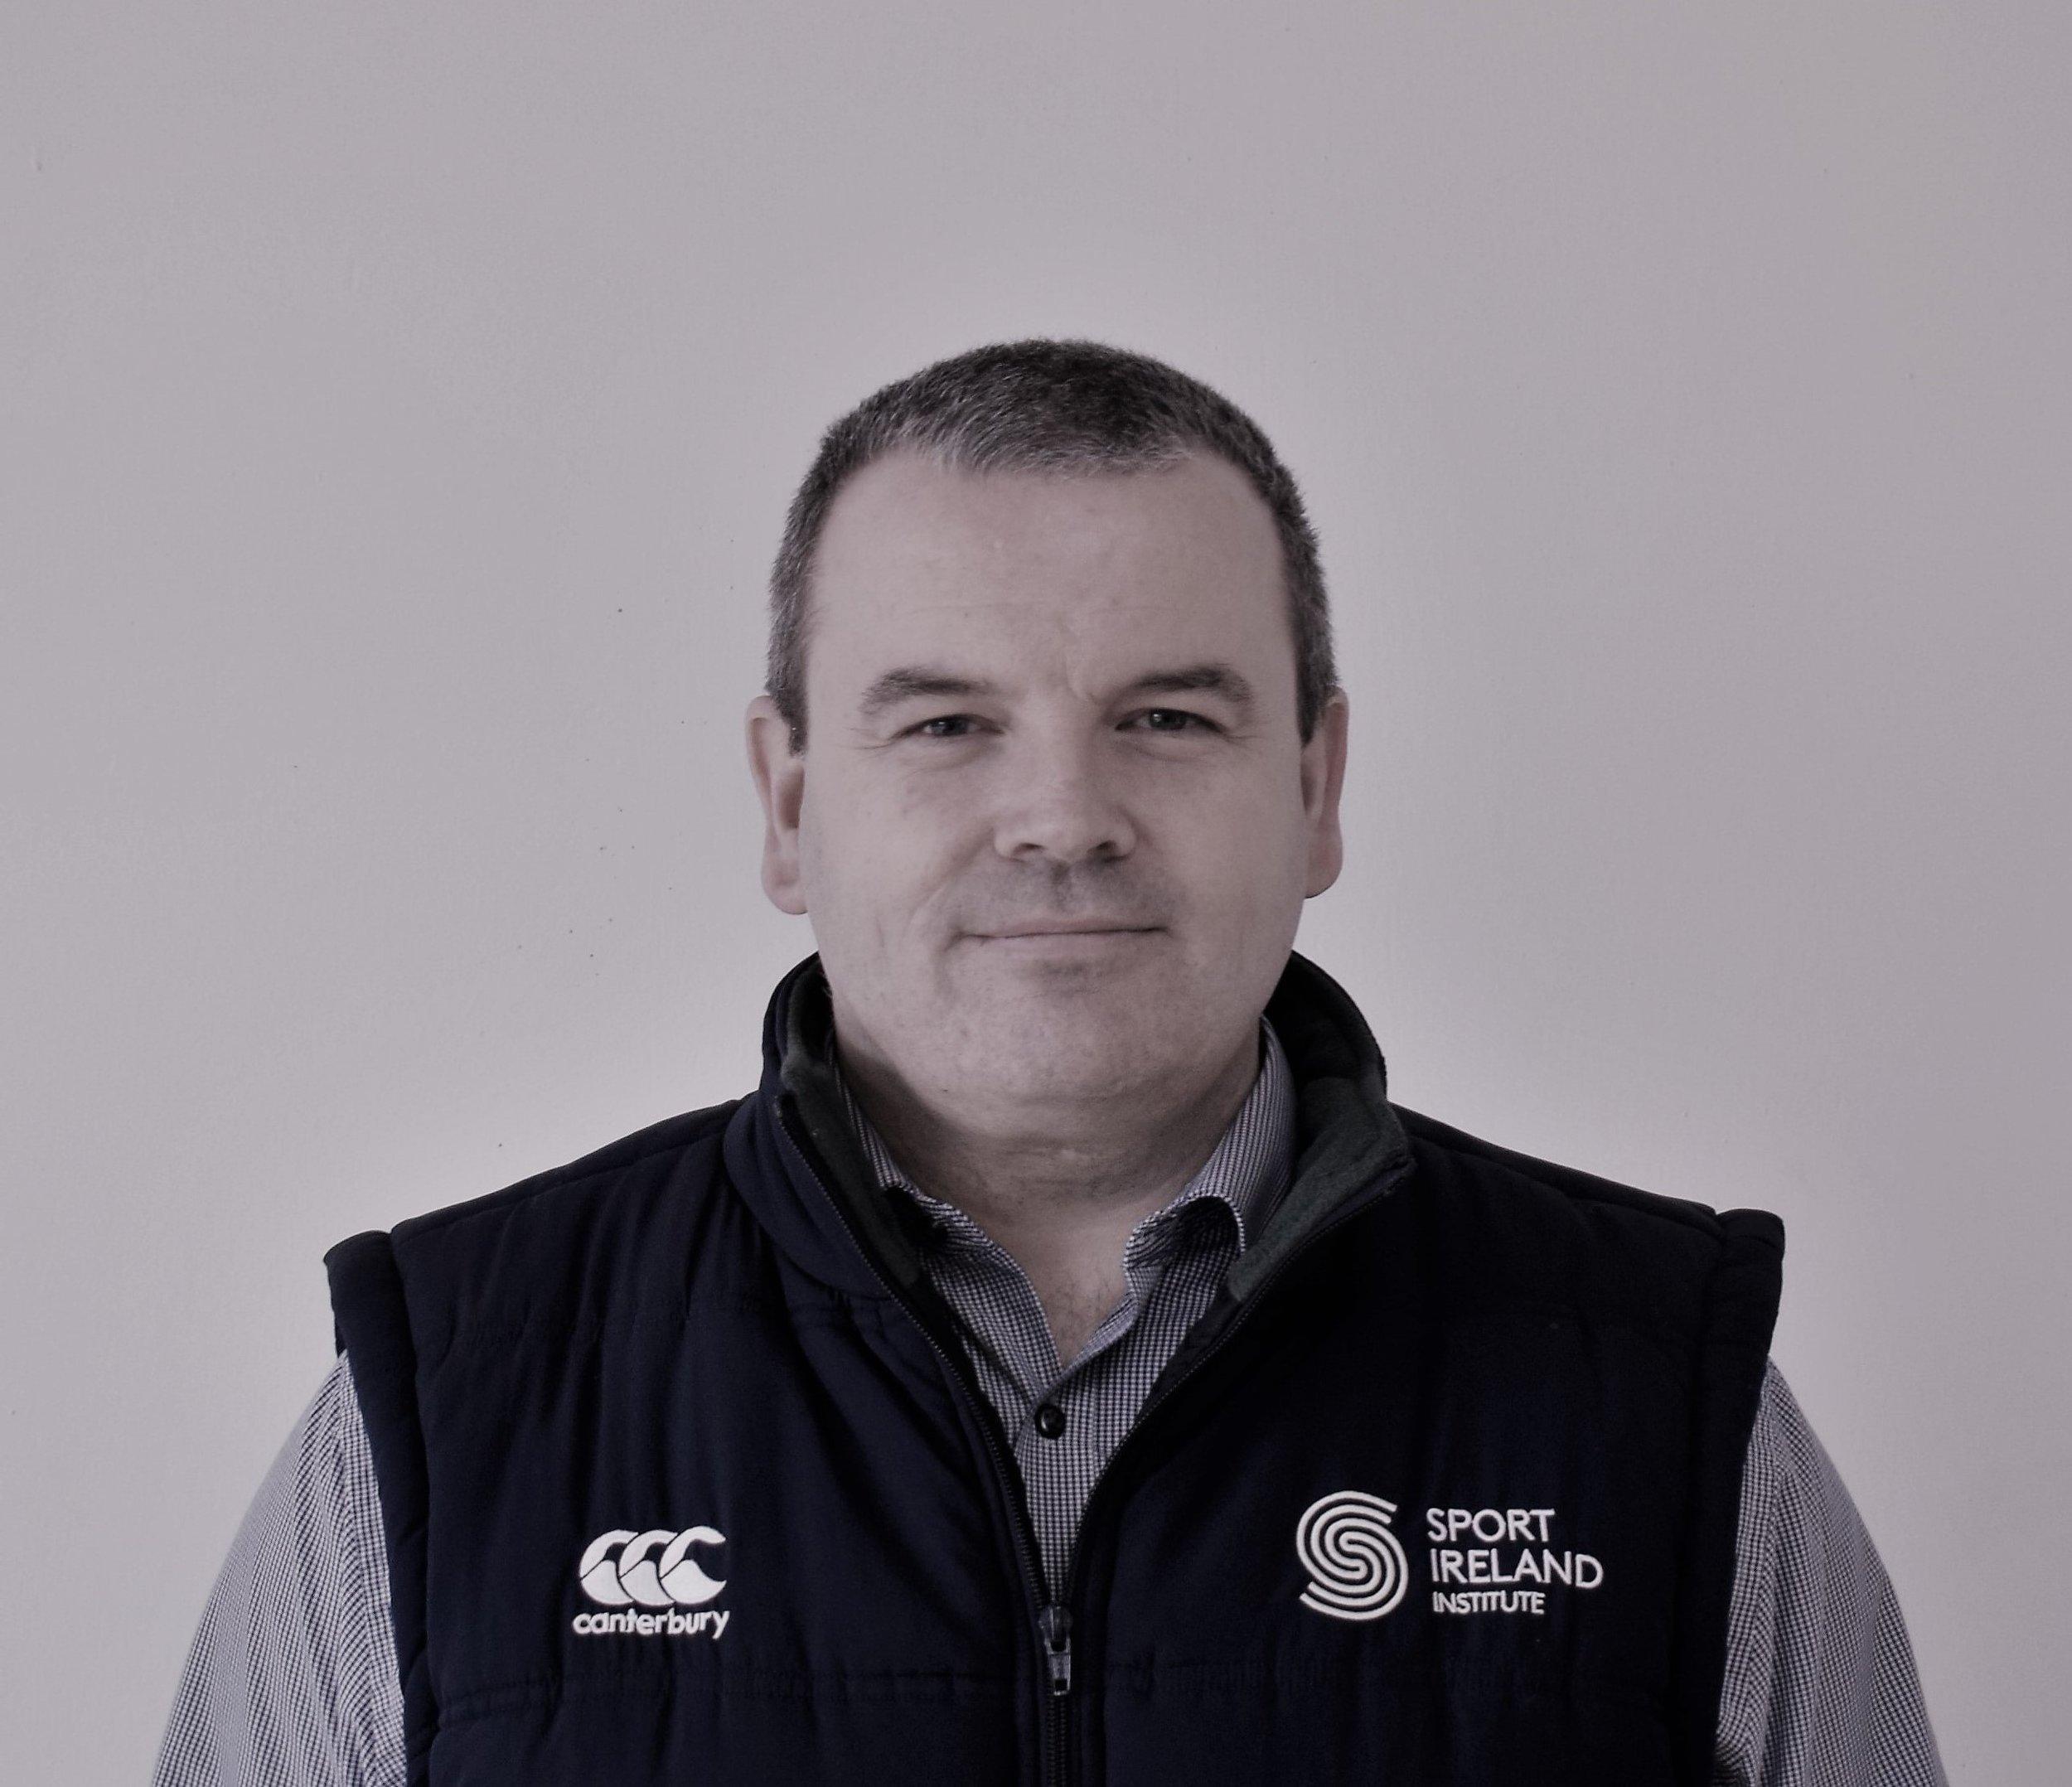 Liam Harbison, Director